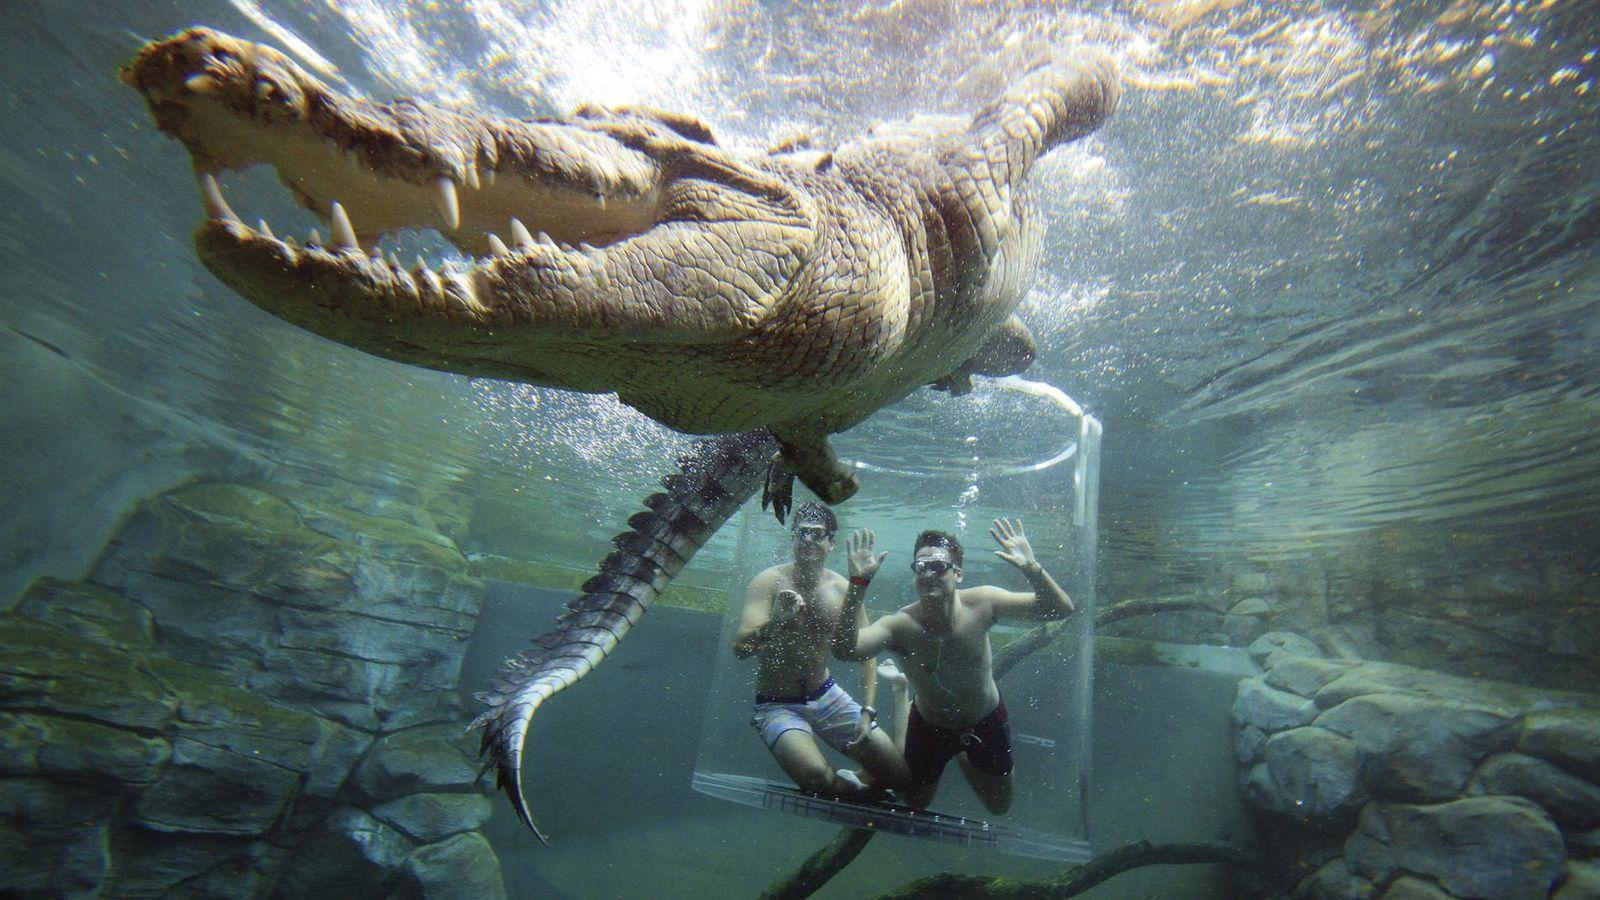 Crocodile experience at the Crocosaurus Cove